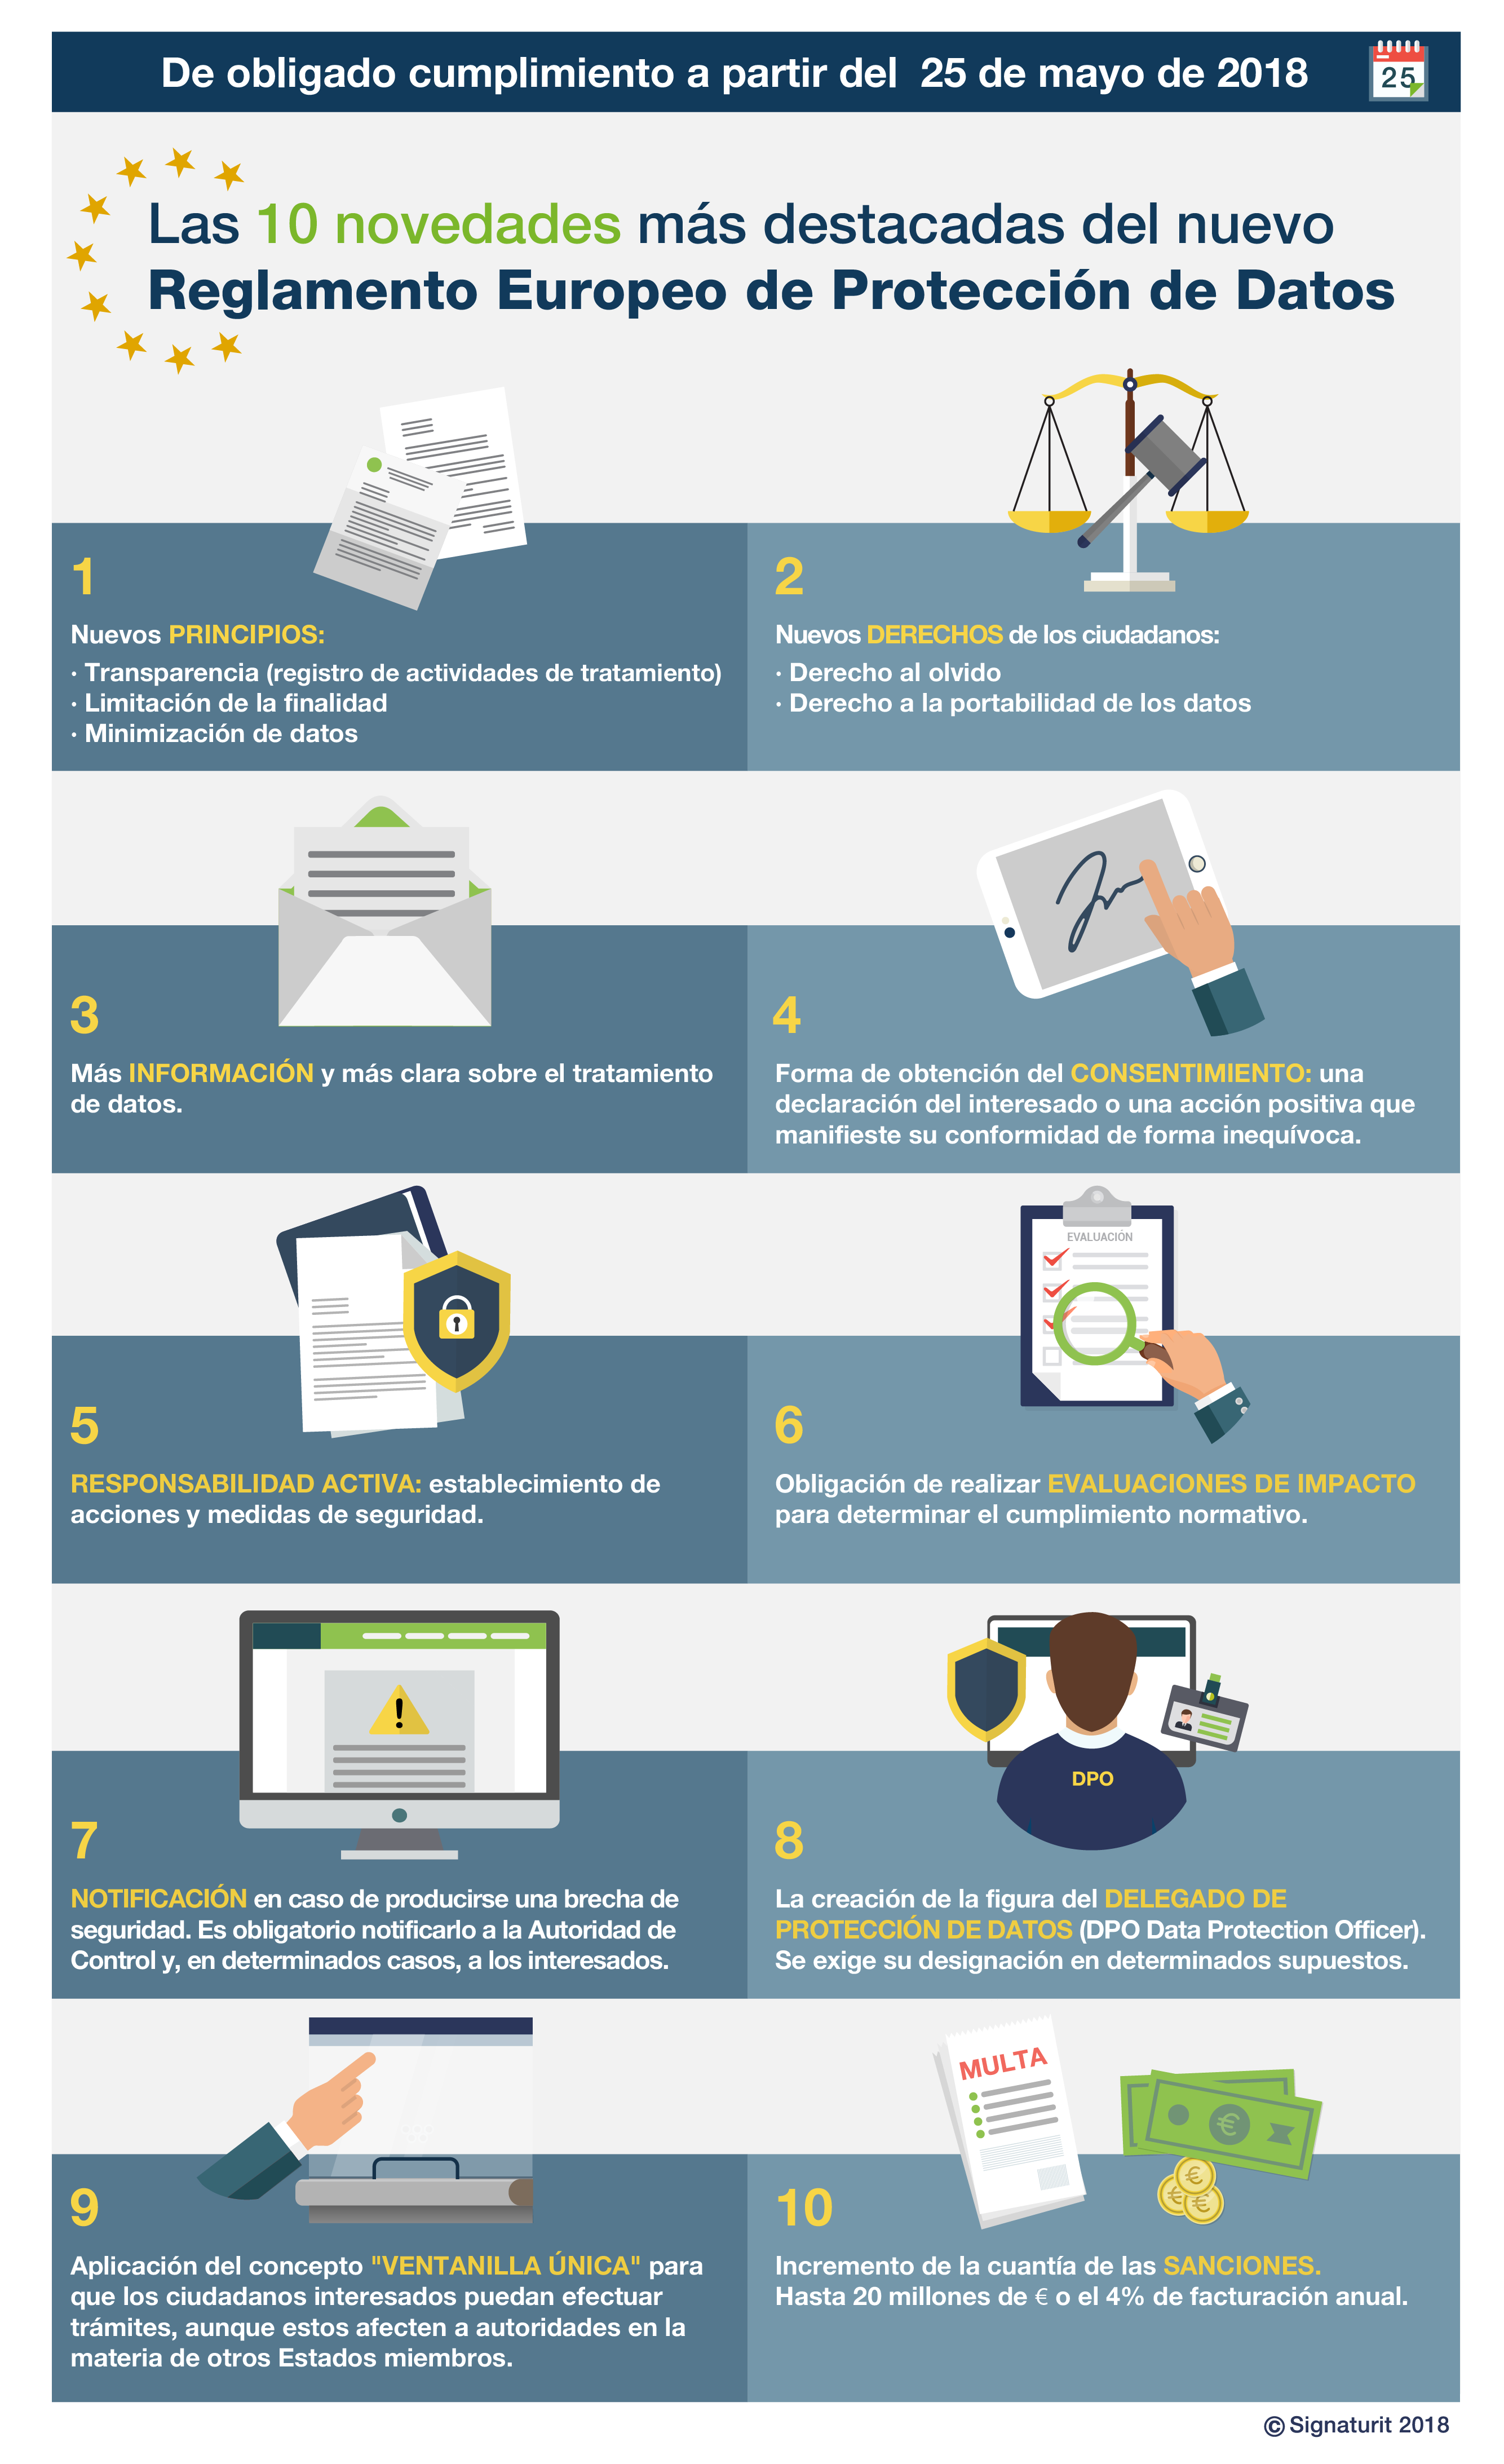 GDPR-infografia-10-novedades-reglamento-europeo-proteccion-de-datos